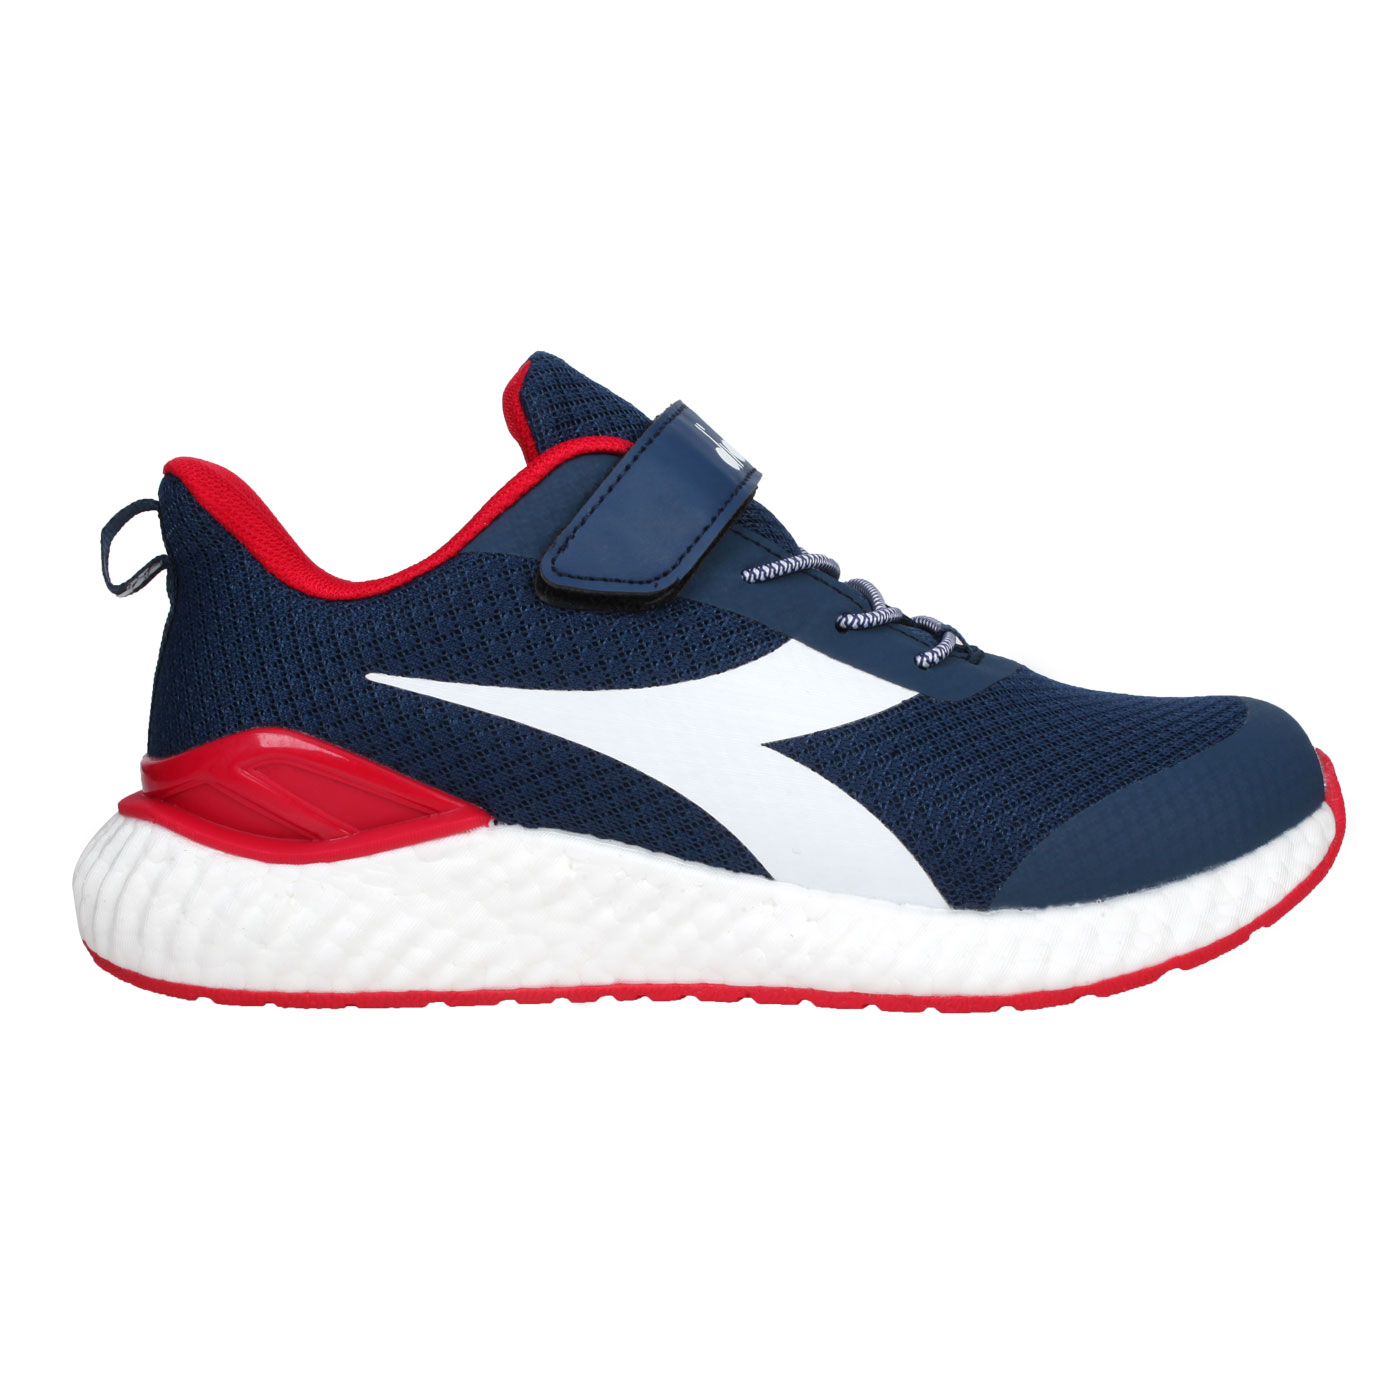 DIADORA 大童運動慢跑鞋-超寬楦 DA13018 - 丈青白紅